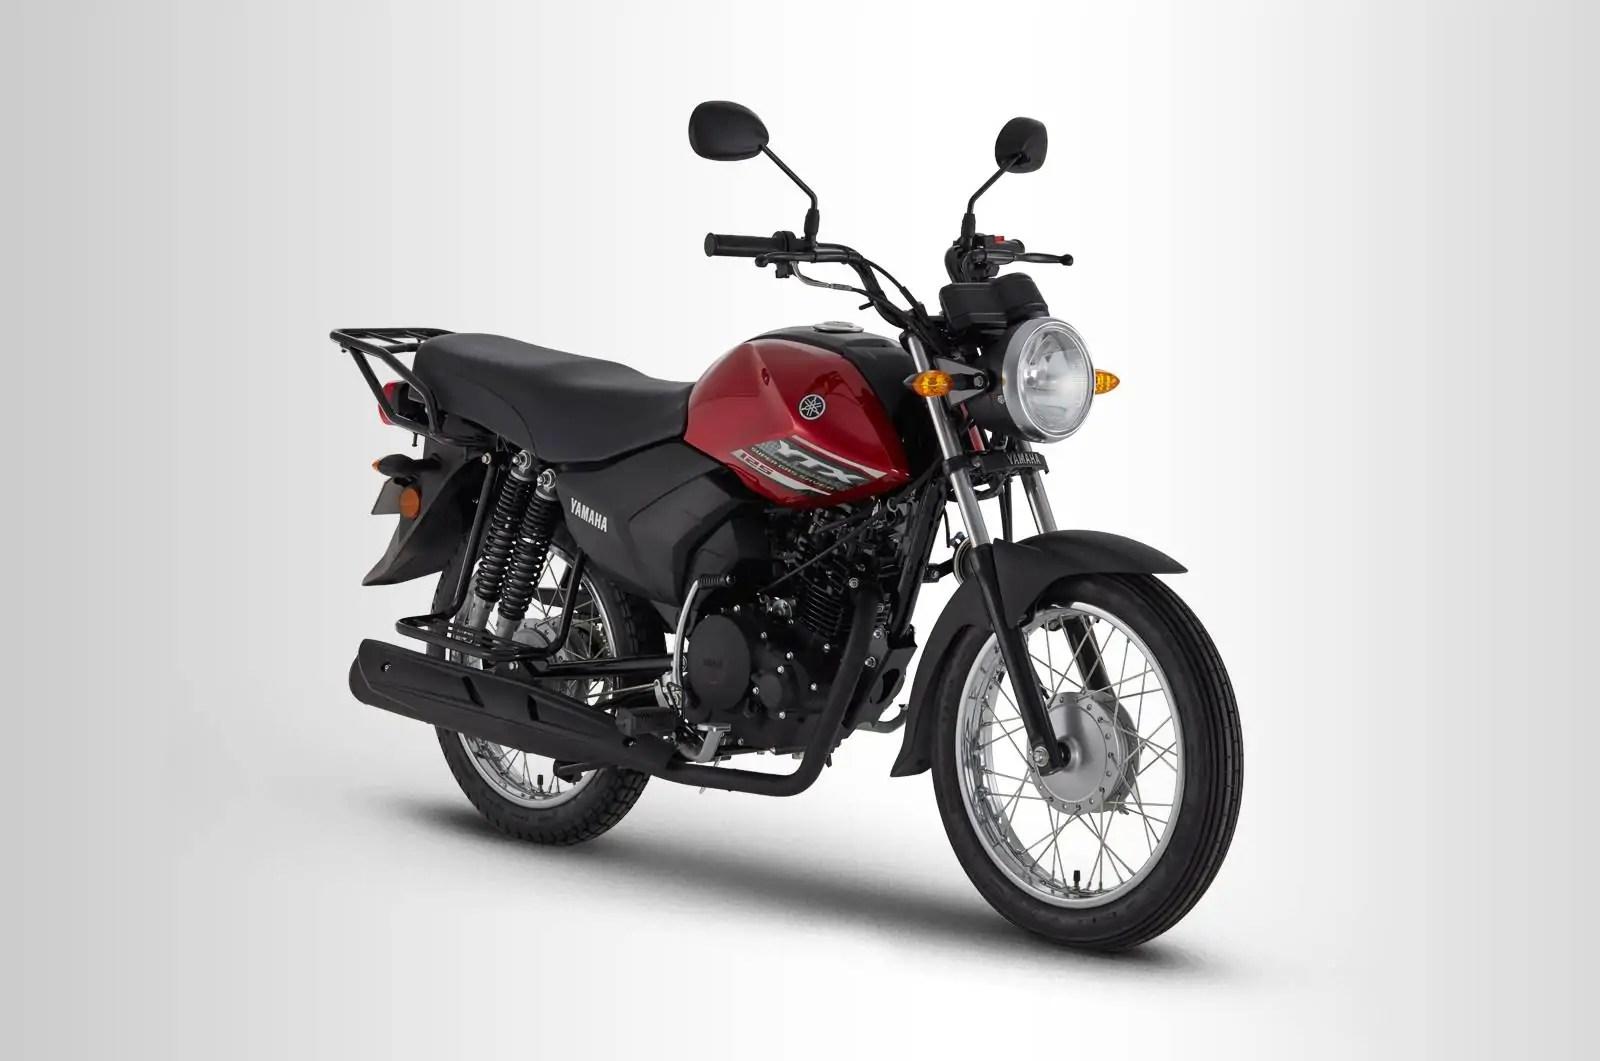 Backbone Frame Motorcycle